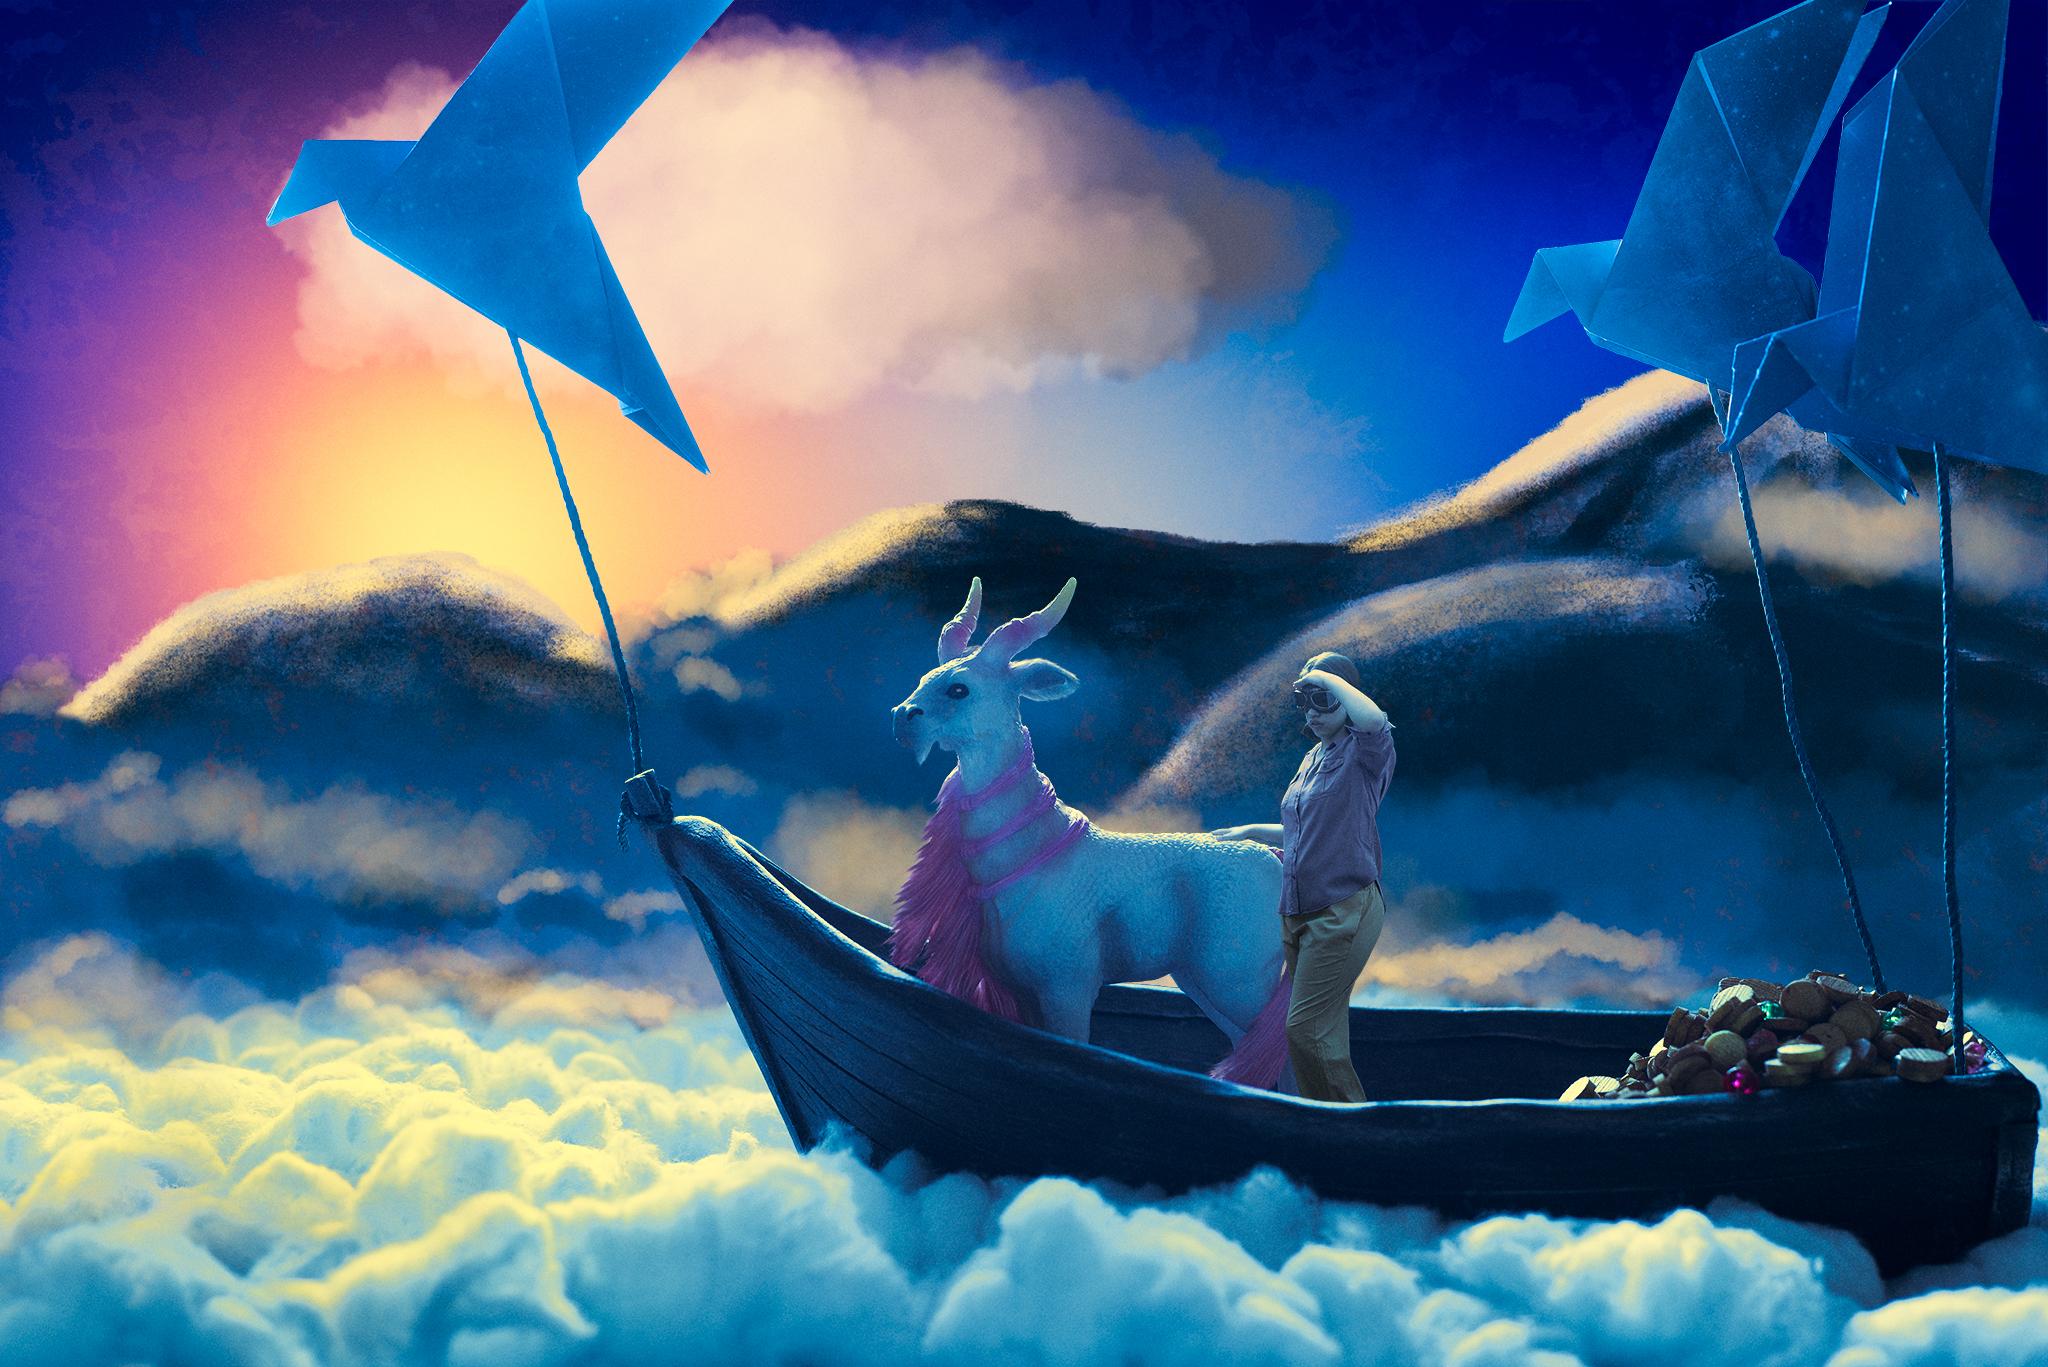 GoatInABoat_FINAL_ErinBeckett_02.jpg